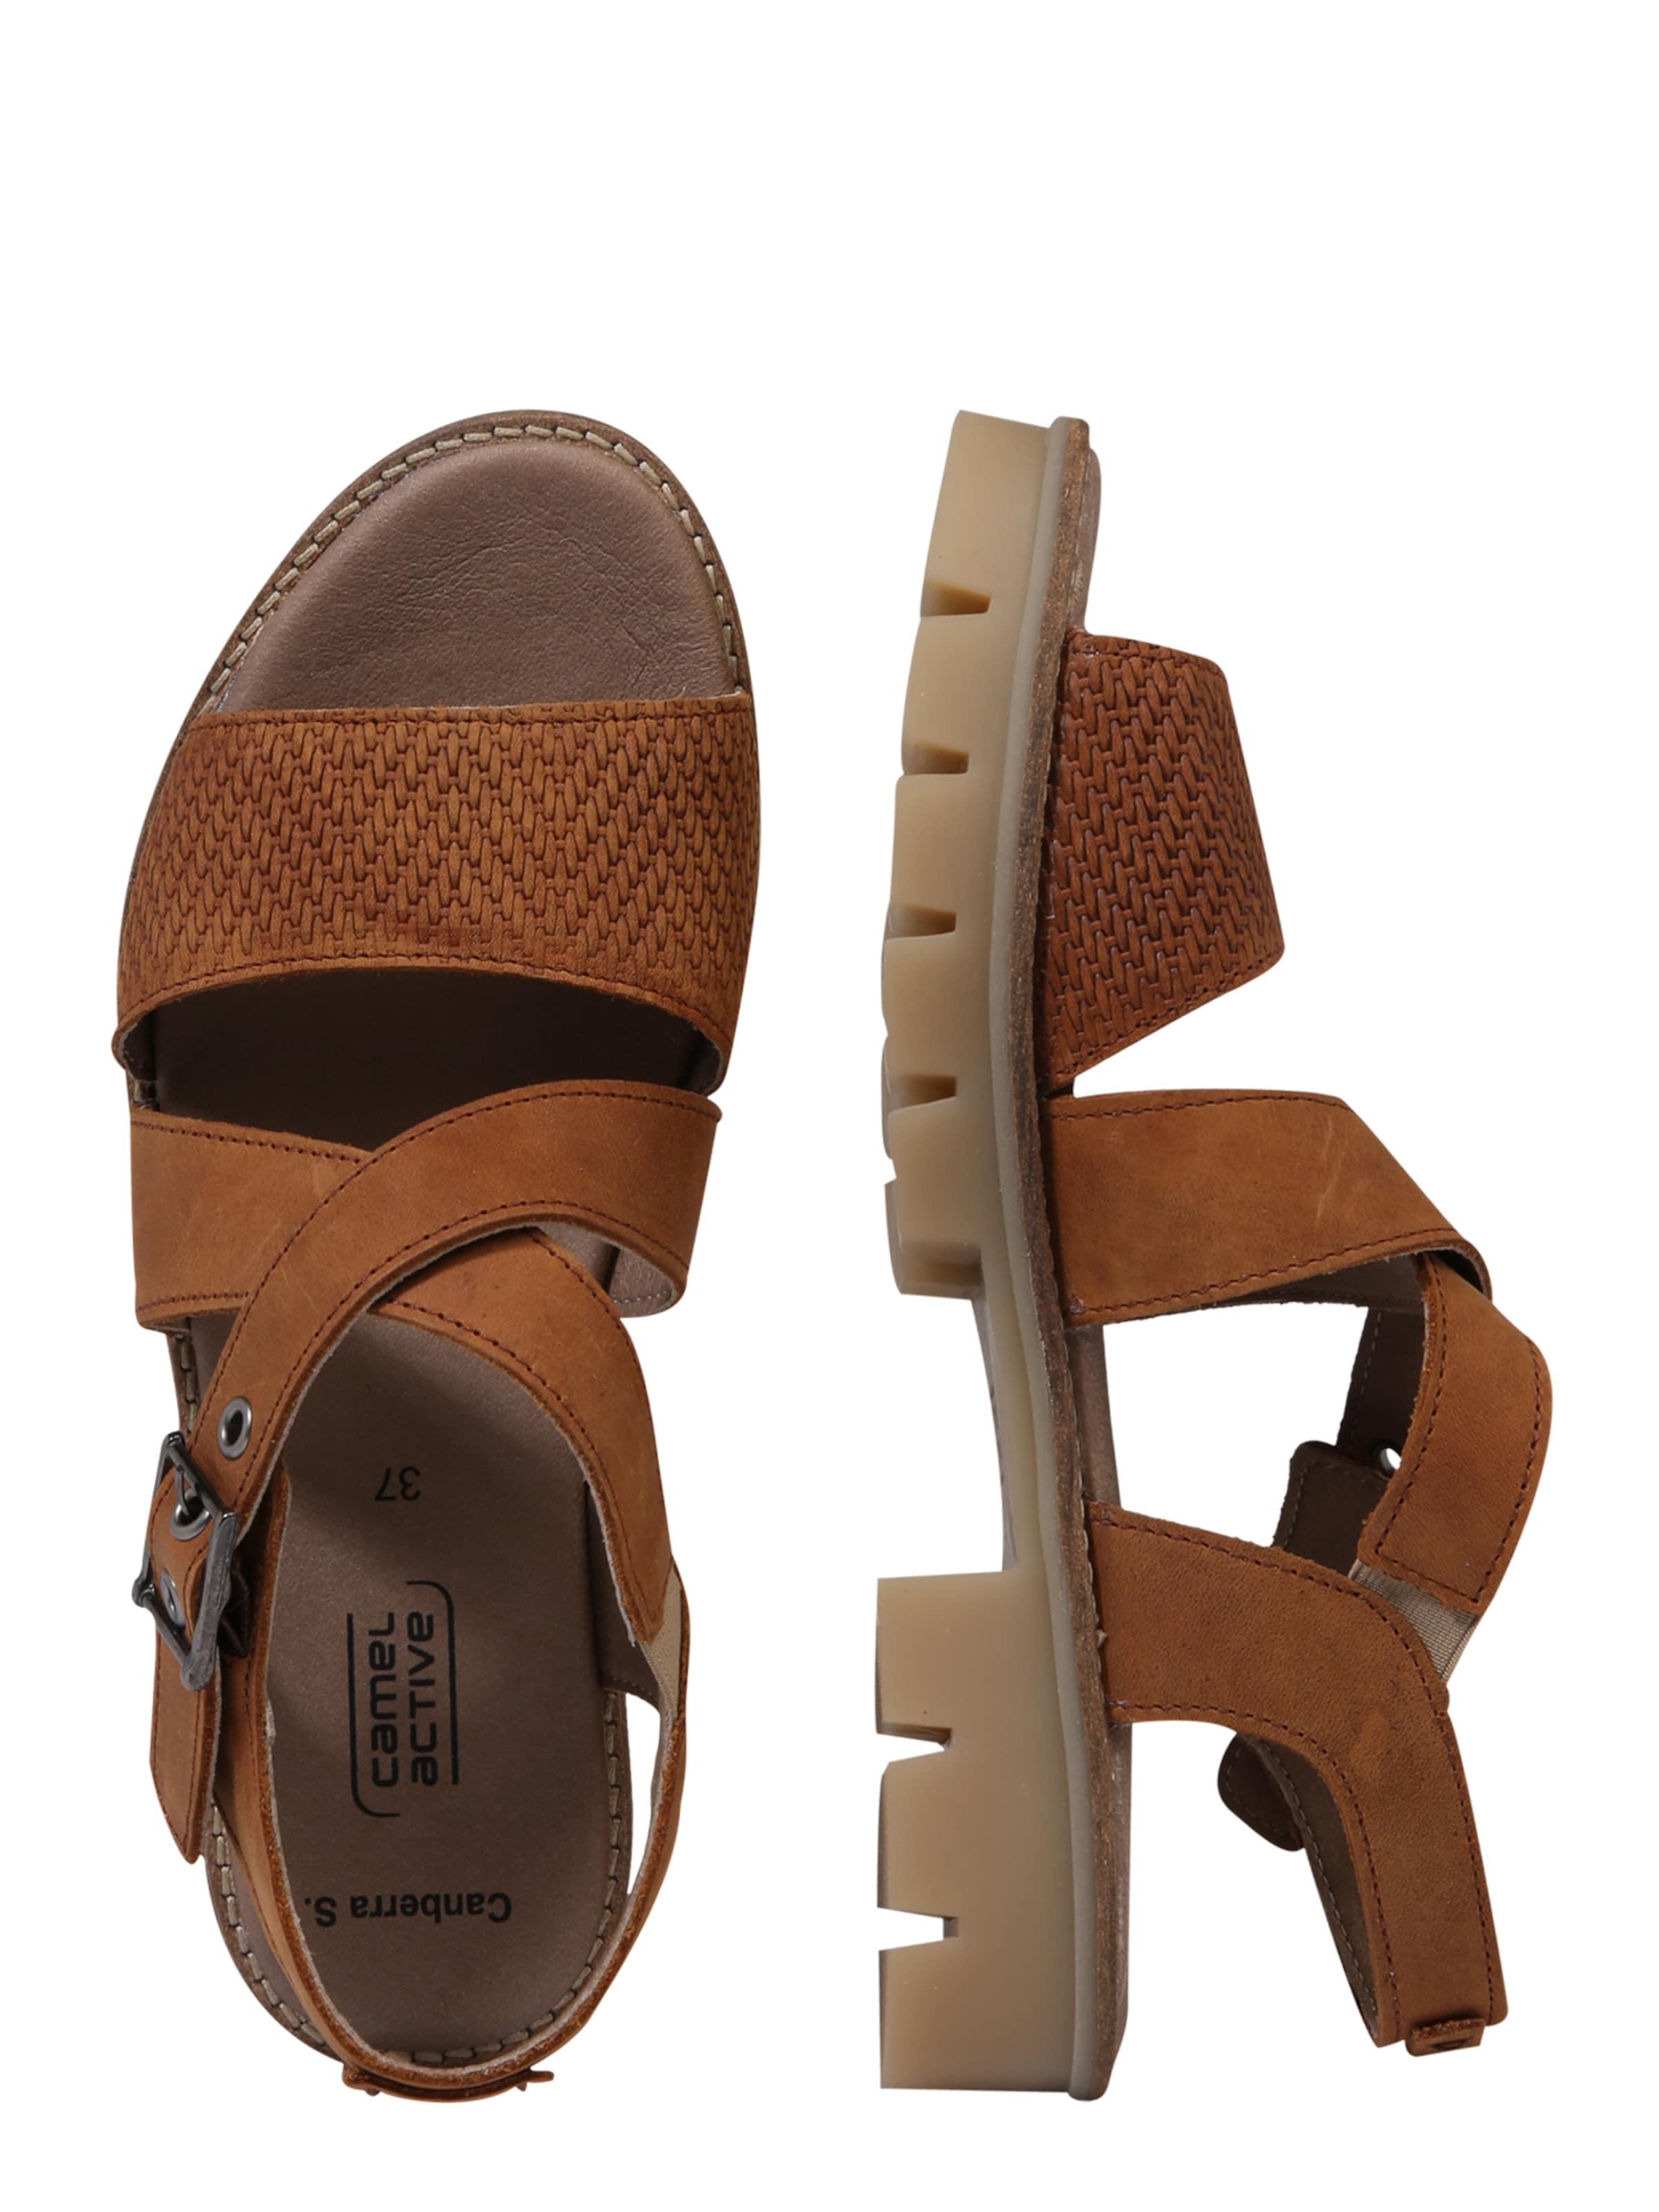 'canberra S71' In Sandale Active Camel Cognac nOPvymN8w0